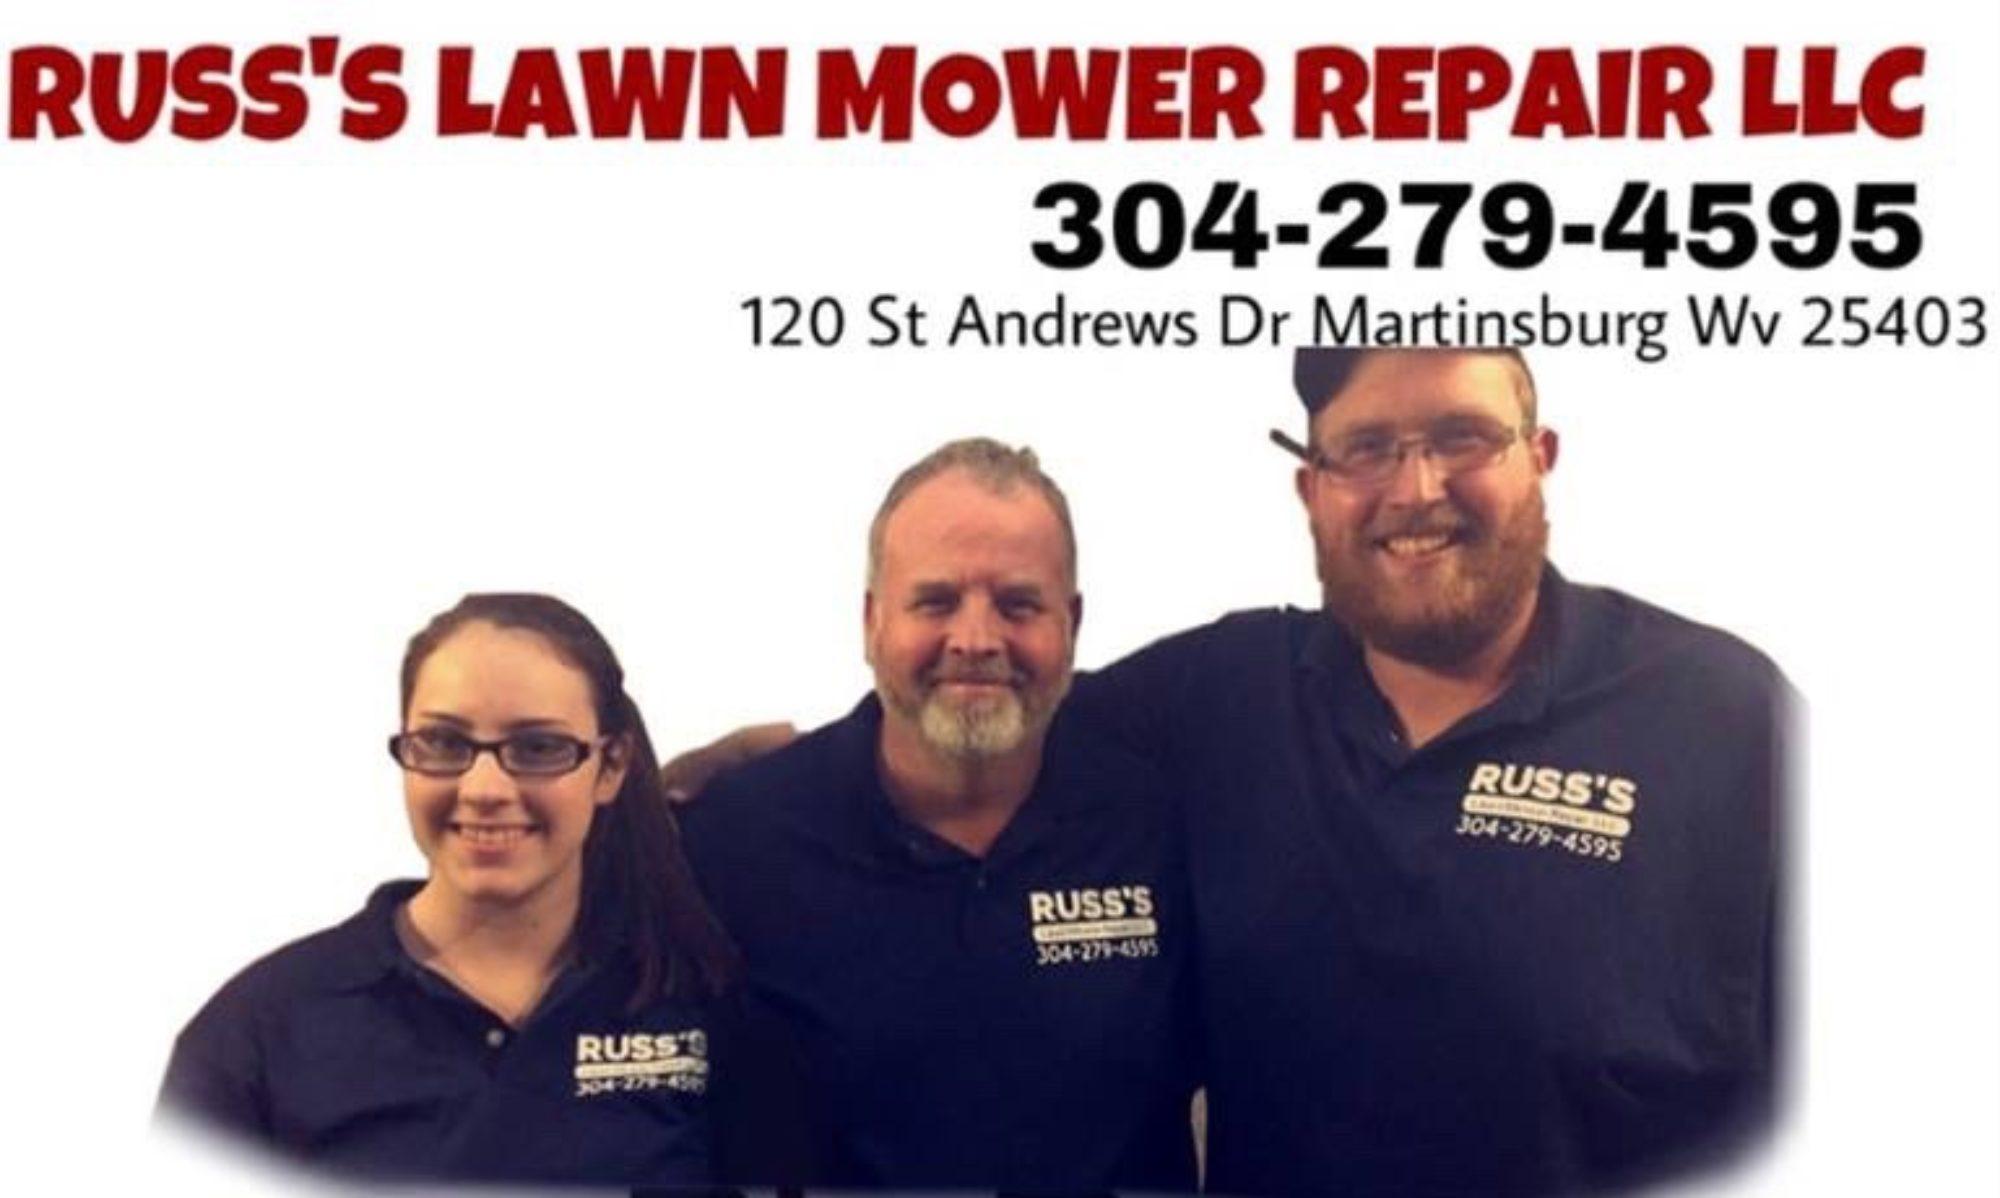 Russ' Lawn Mower Repair LLC